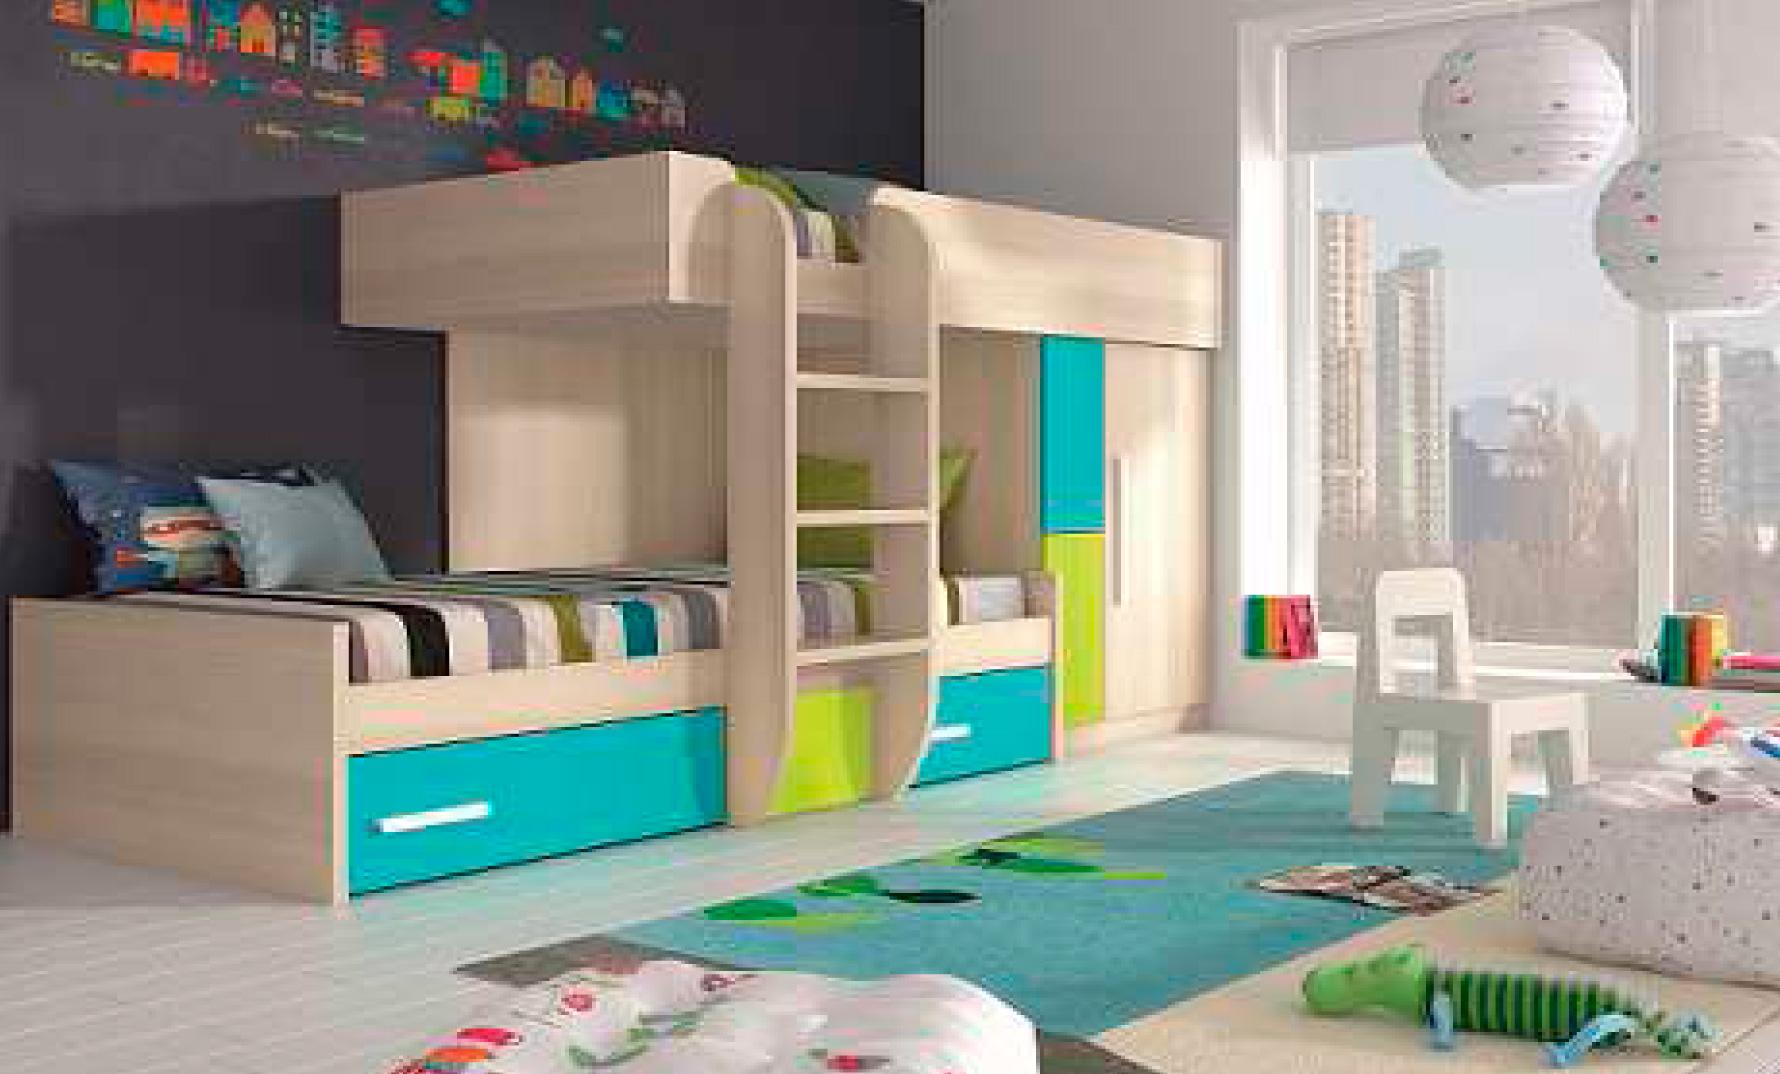 Dormitorio juvenil enjoy2 dormitorios juveniles daicarmobel for Composicion dormitorio juvenil